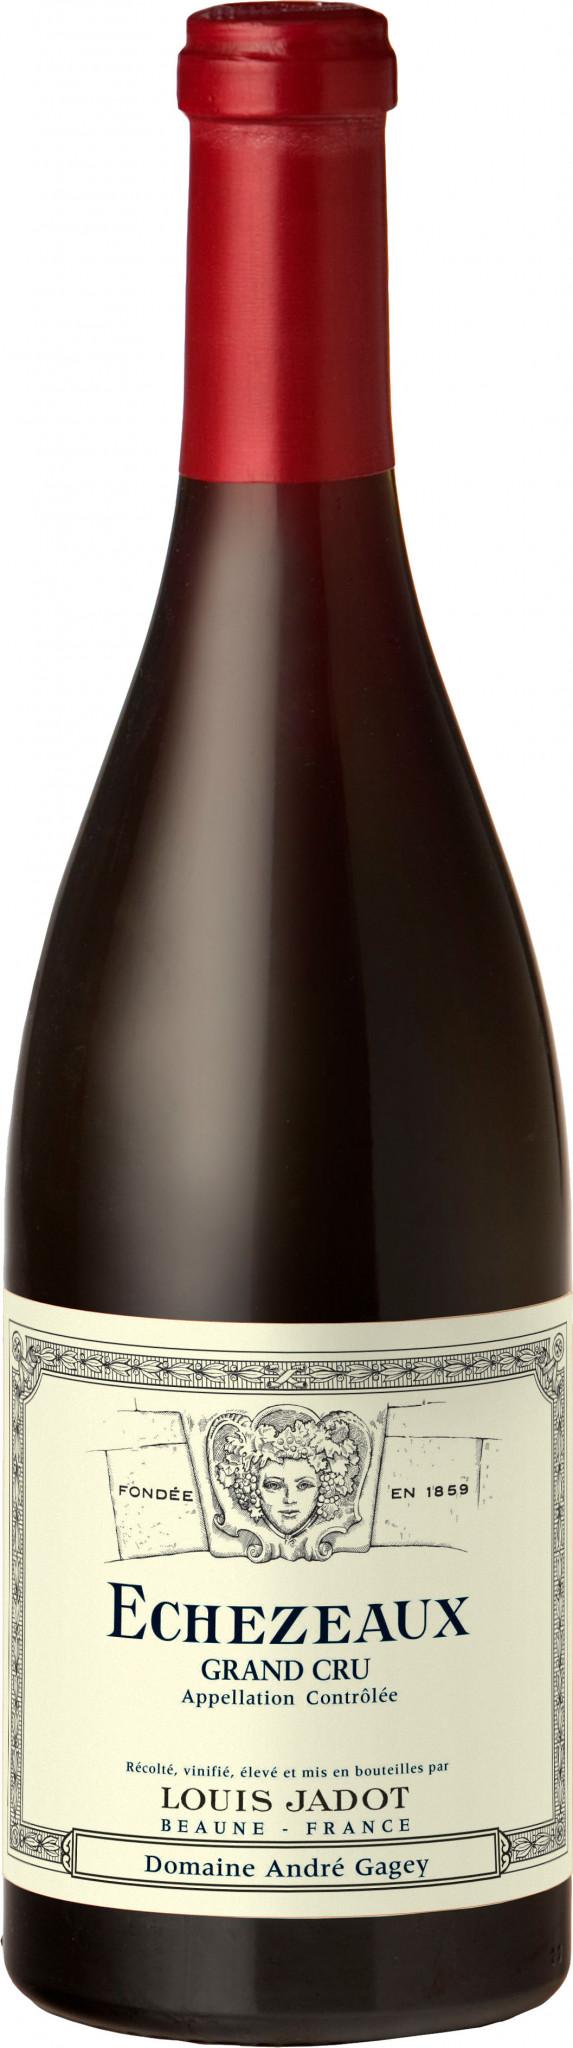 Louis Jadot Echézeaux Domaine Gagey Wineaffair